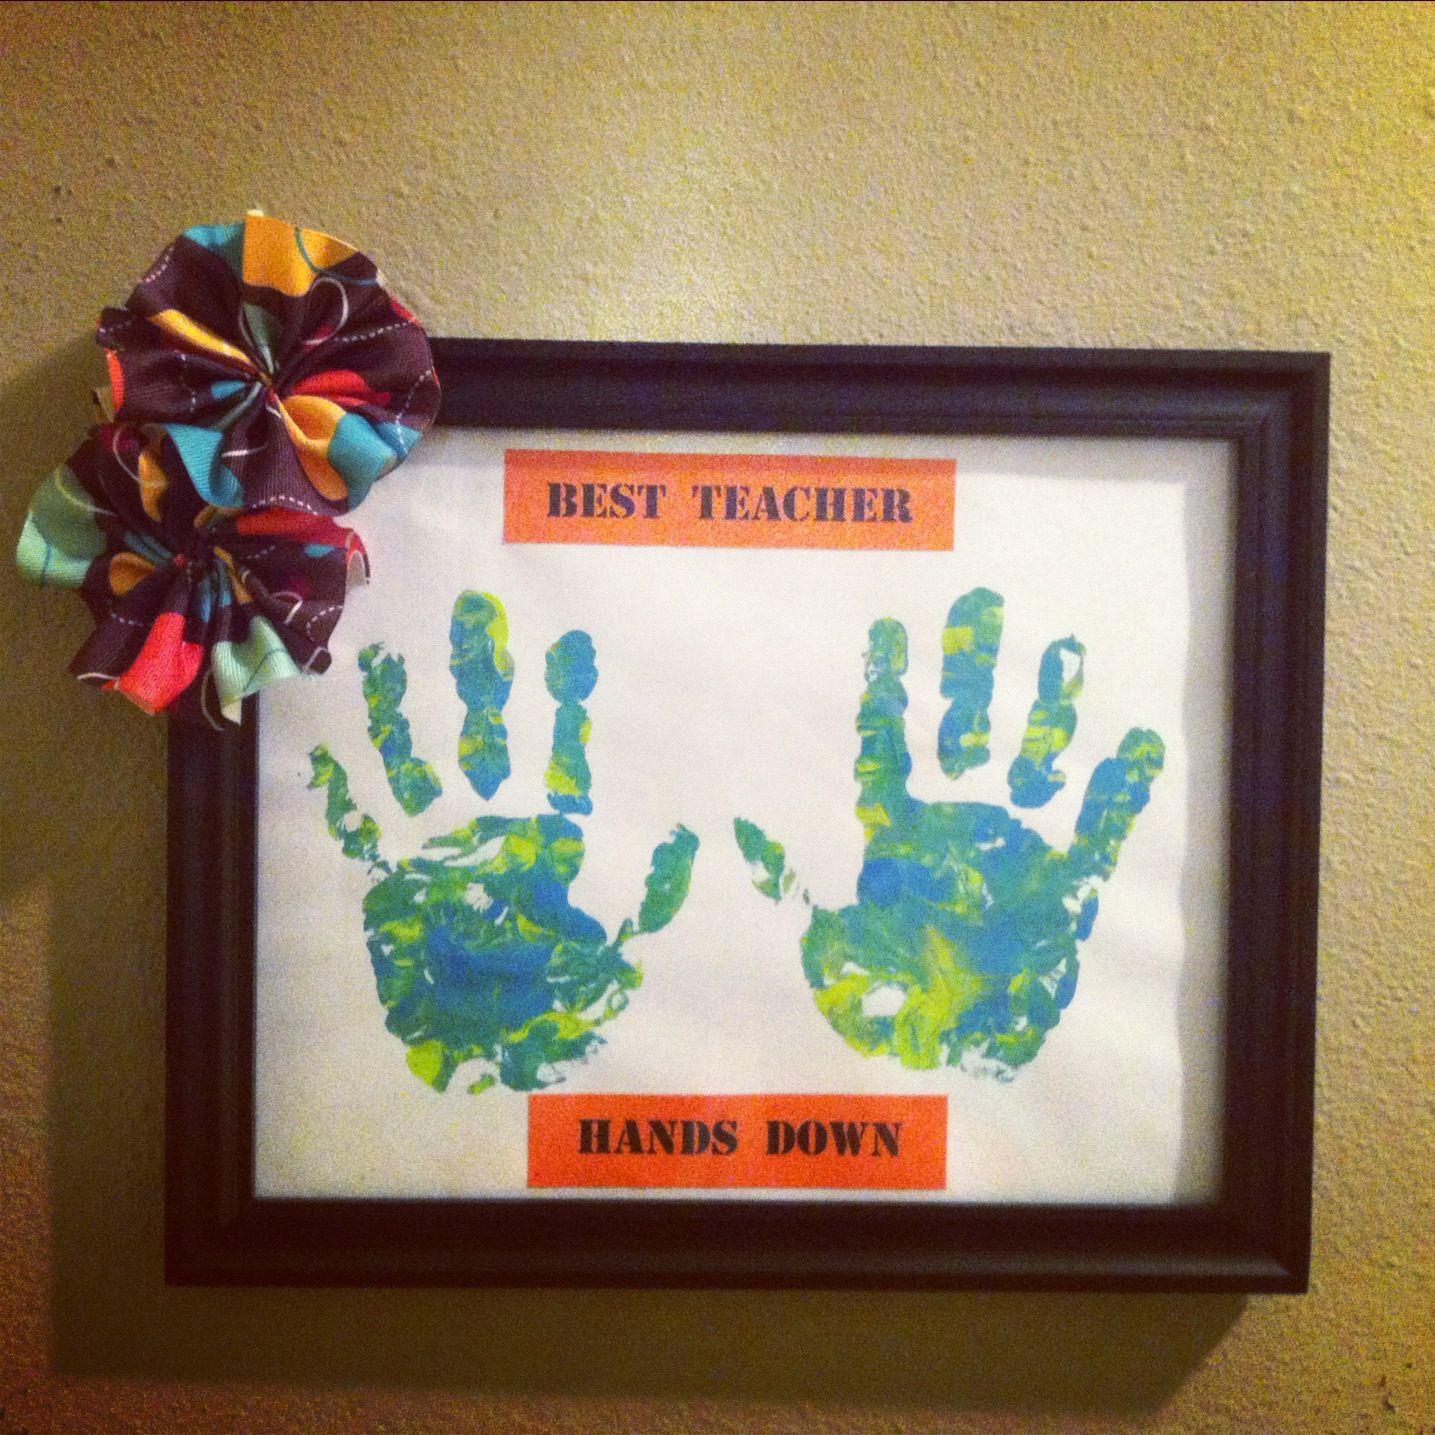 Pin By Jennifer Cotton On My Creations Designs Presents For Teachers School Gifts Preschool Teacher Gifts